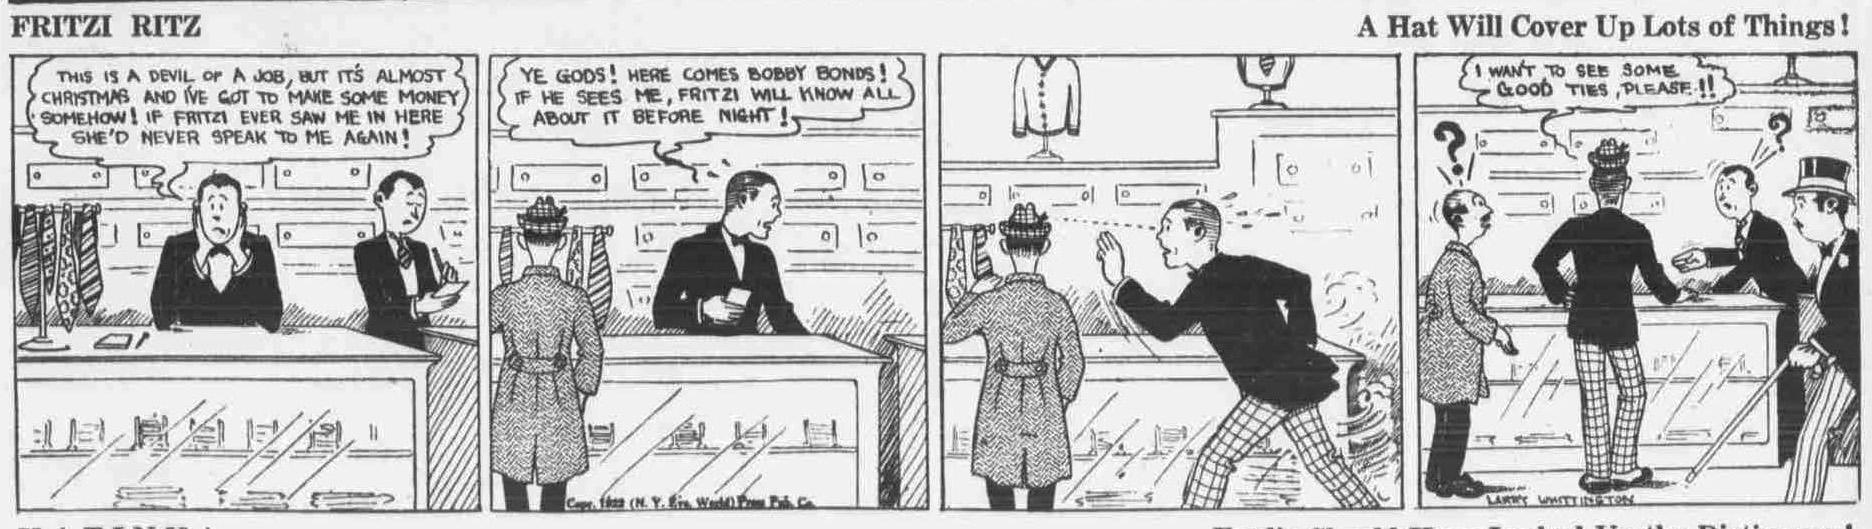 Dec. 11, 1922